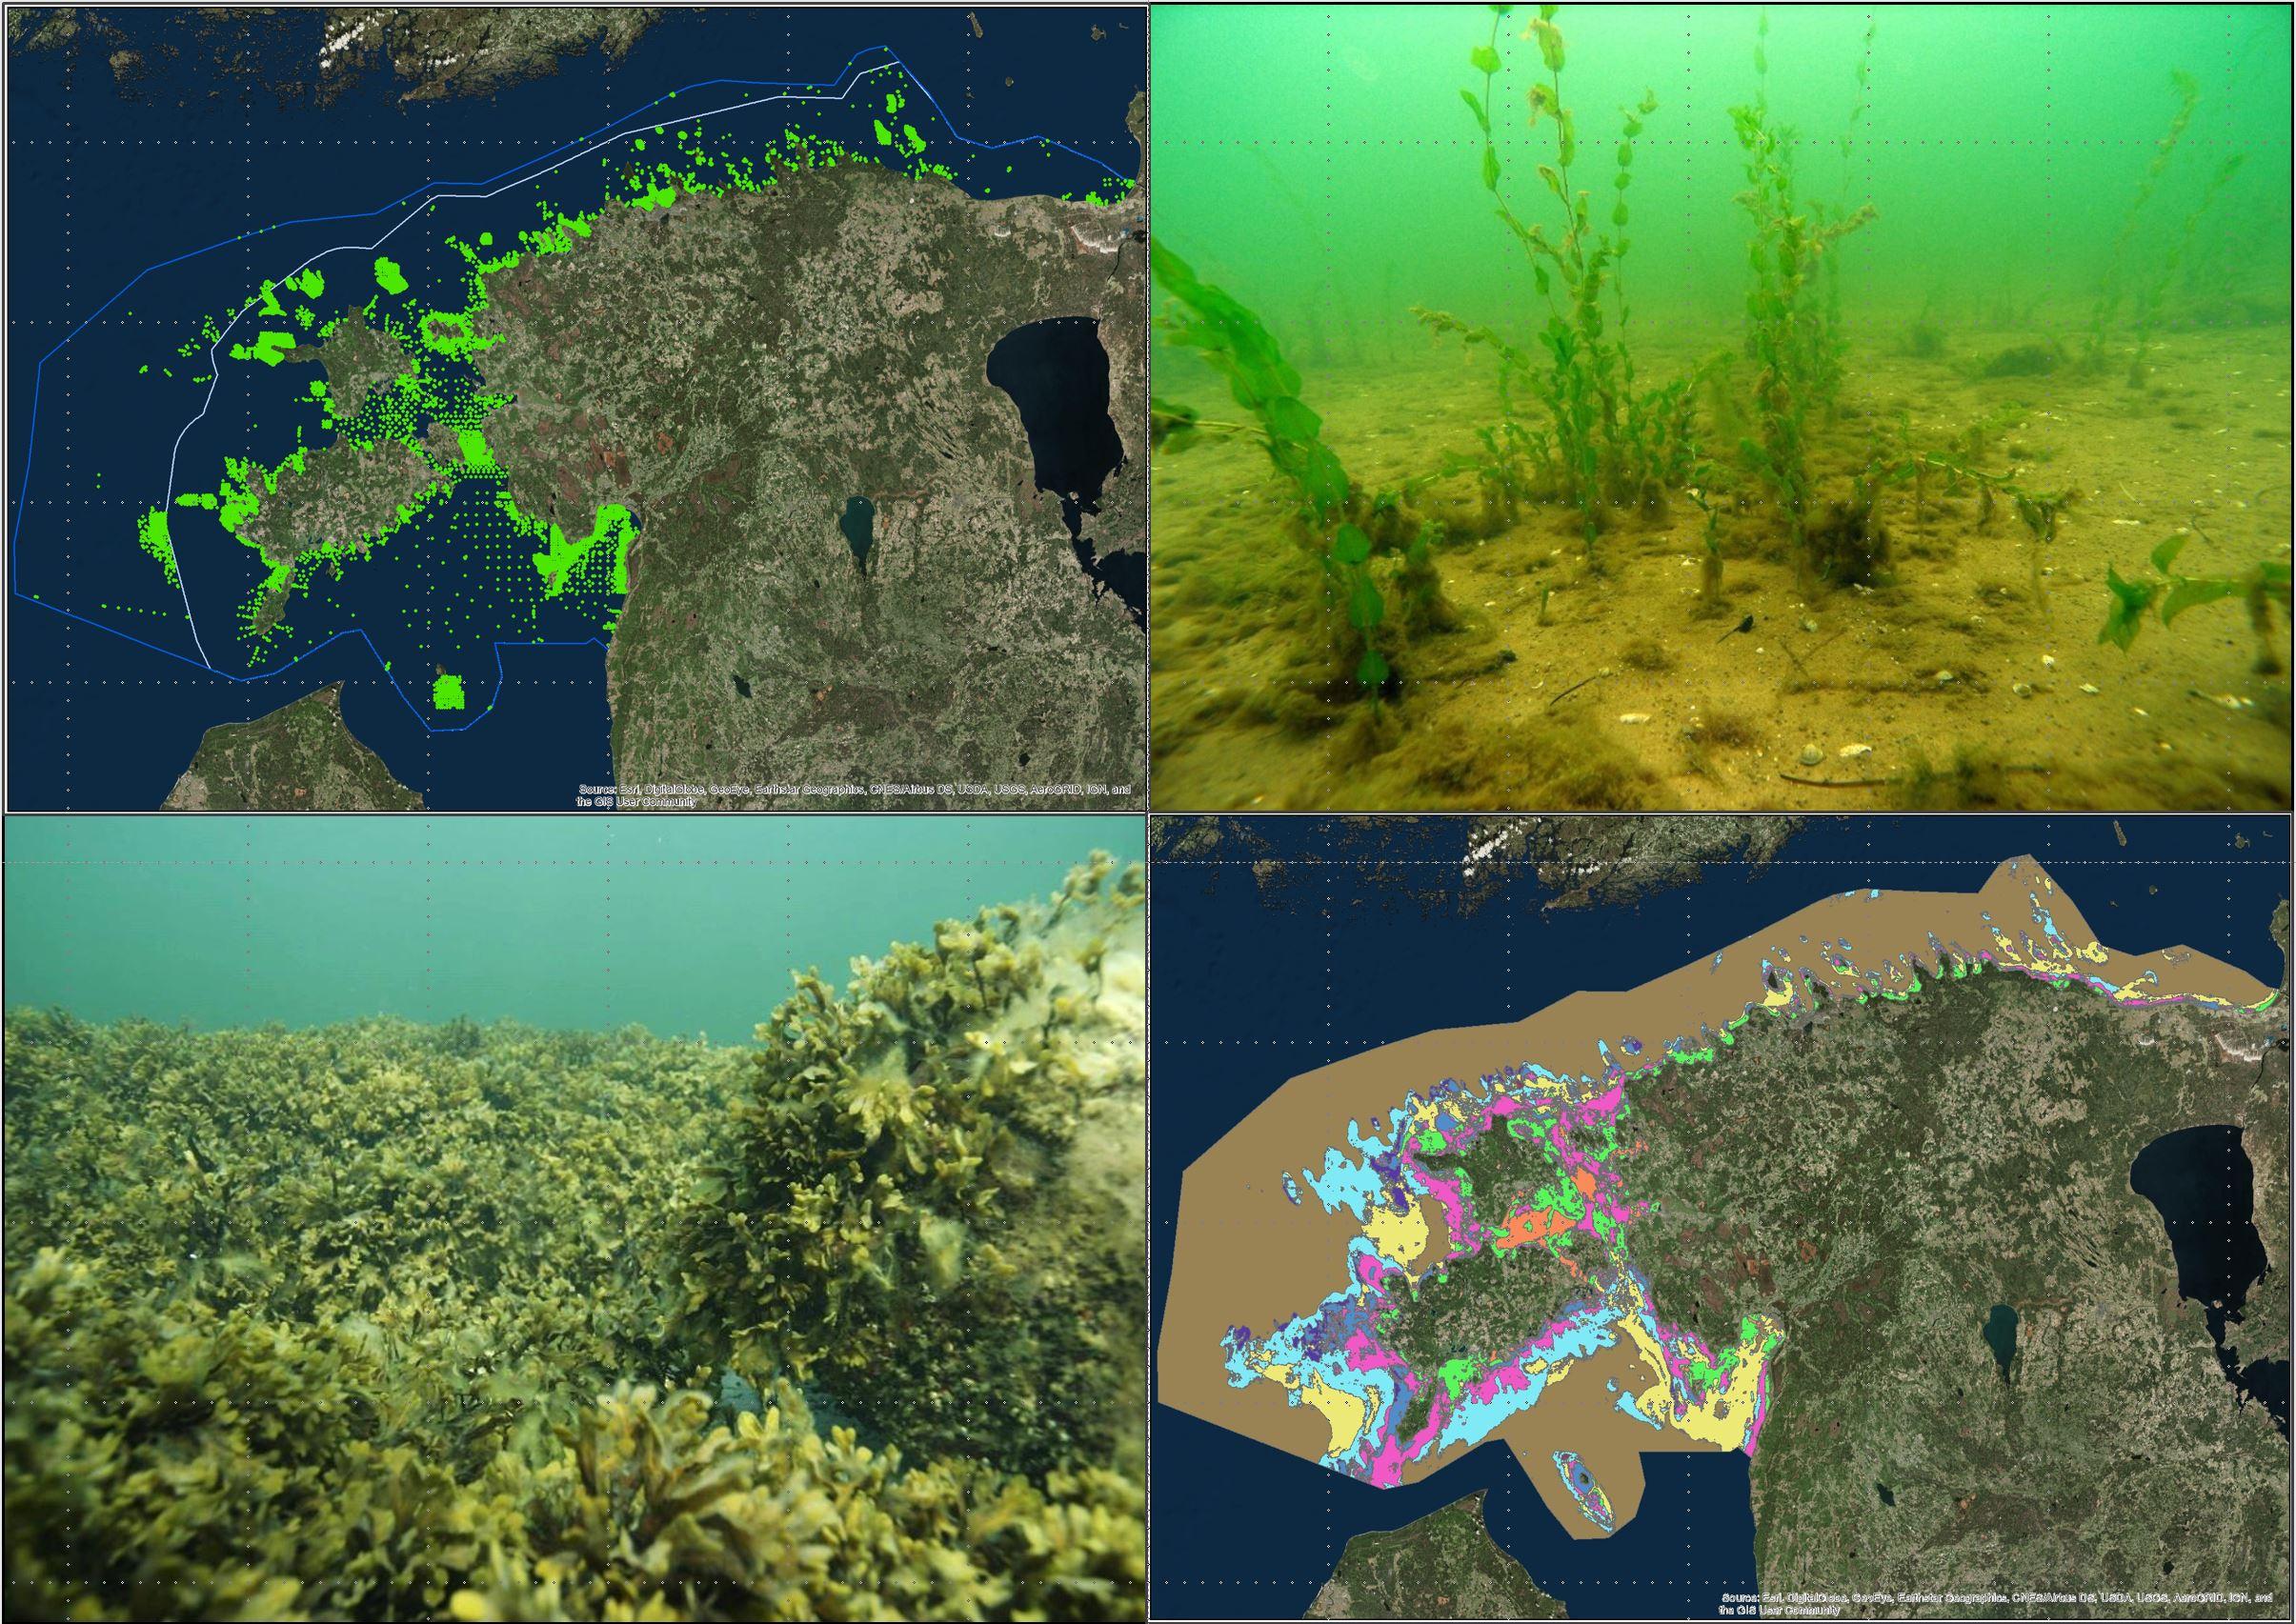 Potential visual display of GIS portal data layers